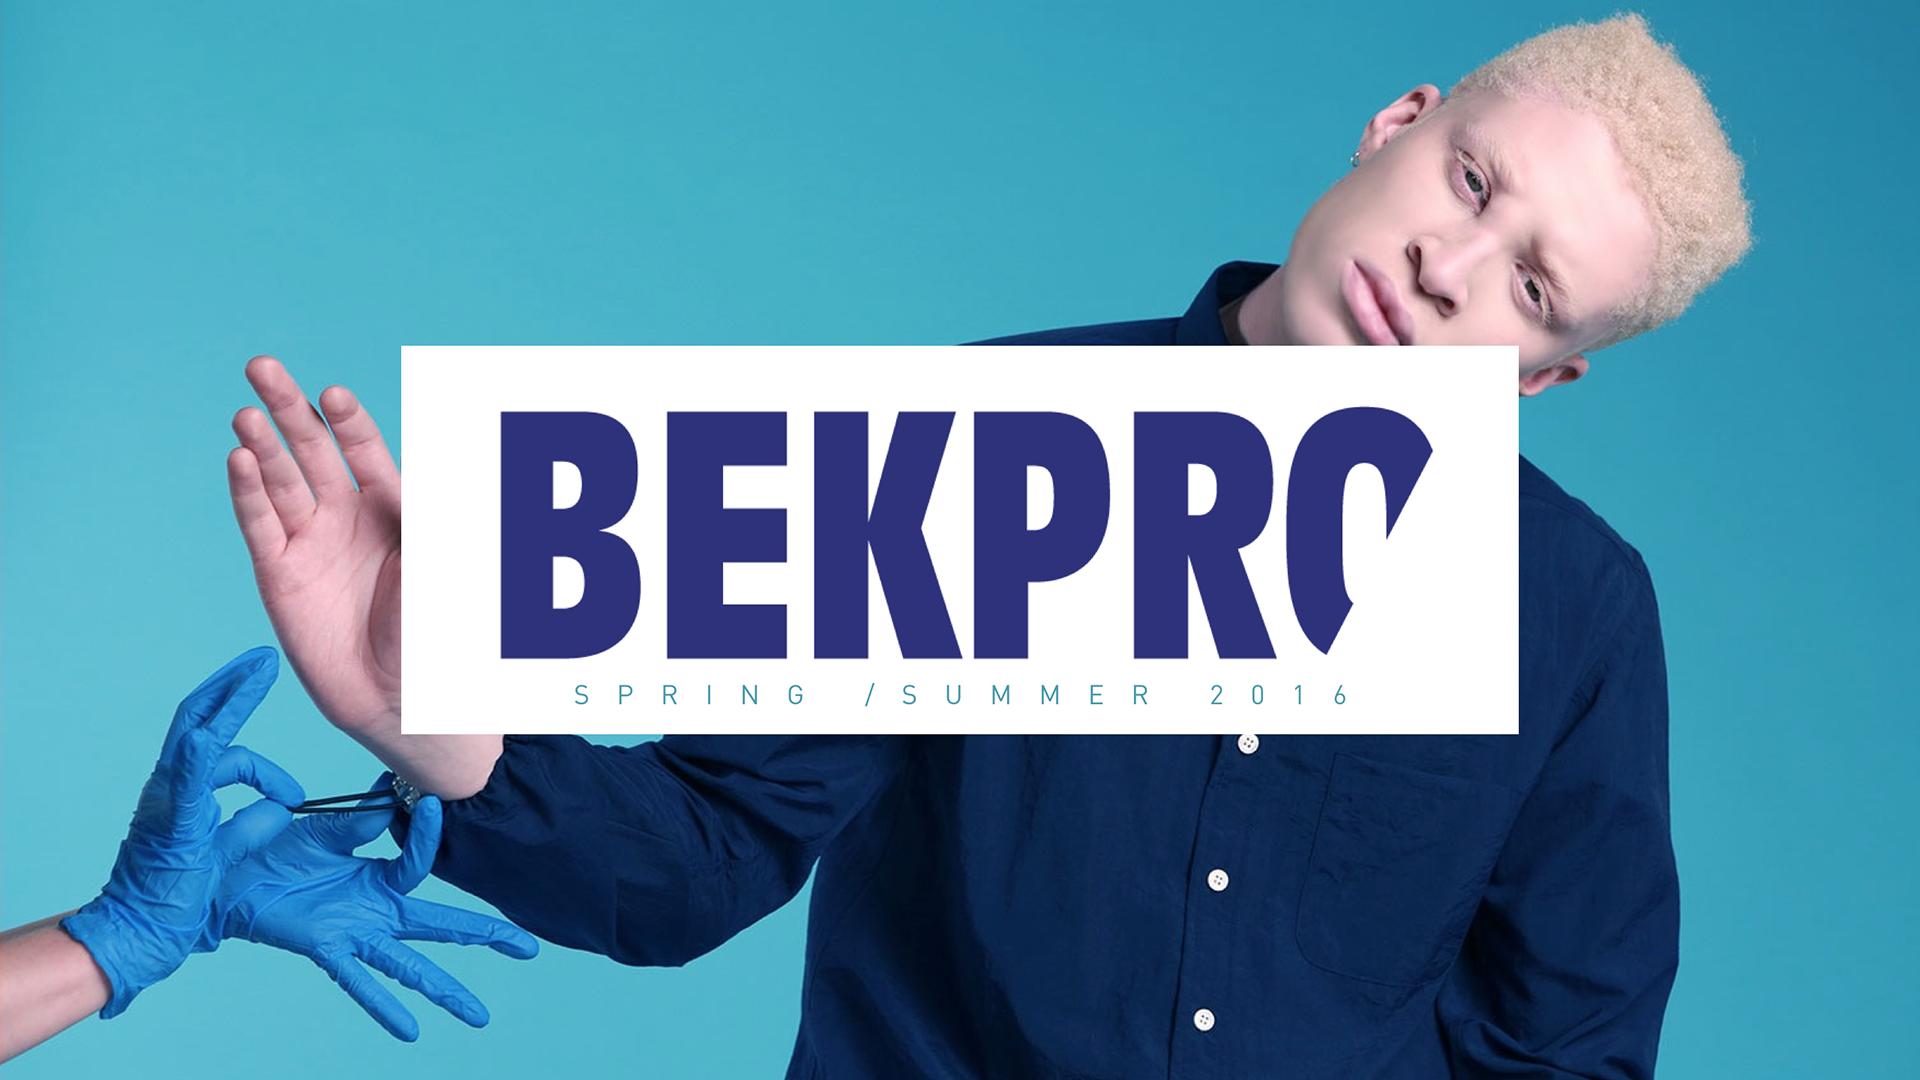 bekpro_thumb